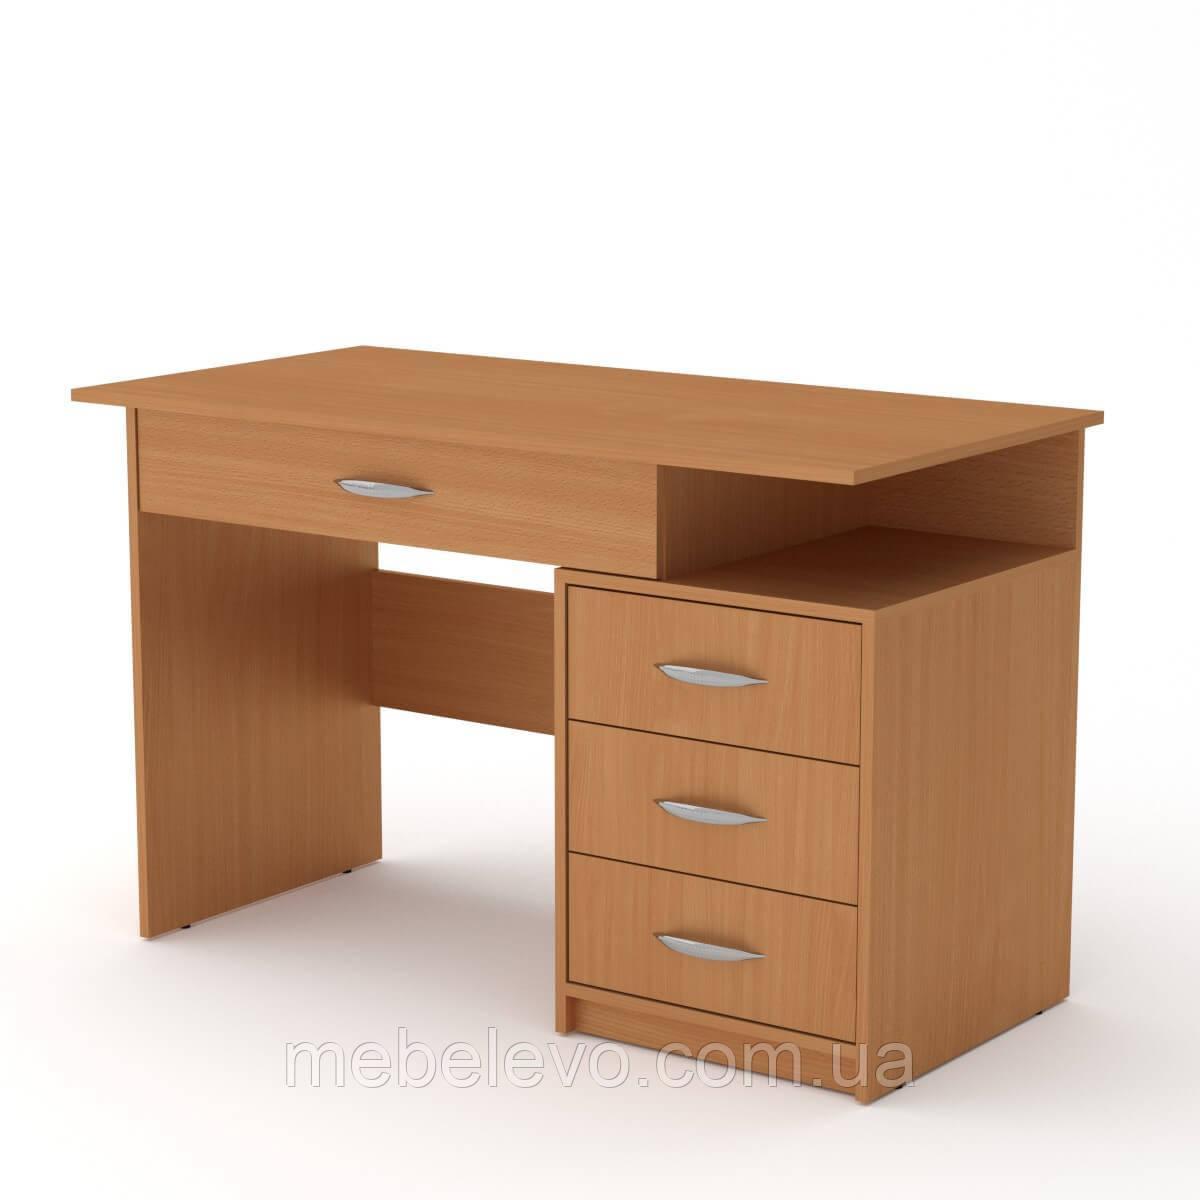 Стол письменный Студент-2 750х1200х600мм    Компанит